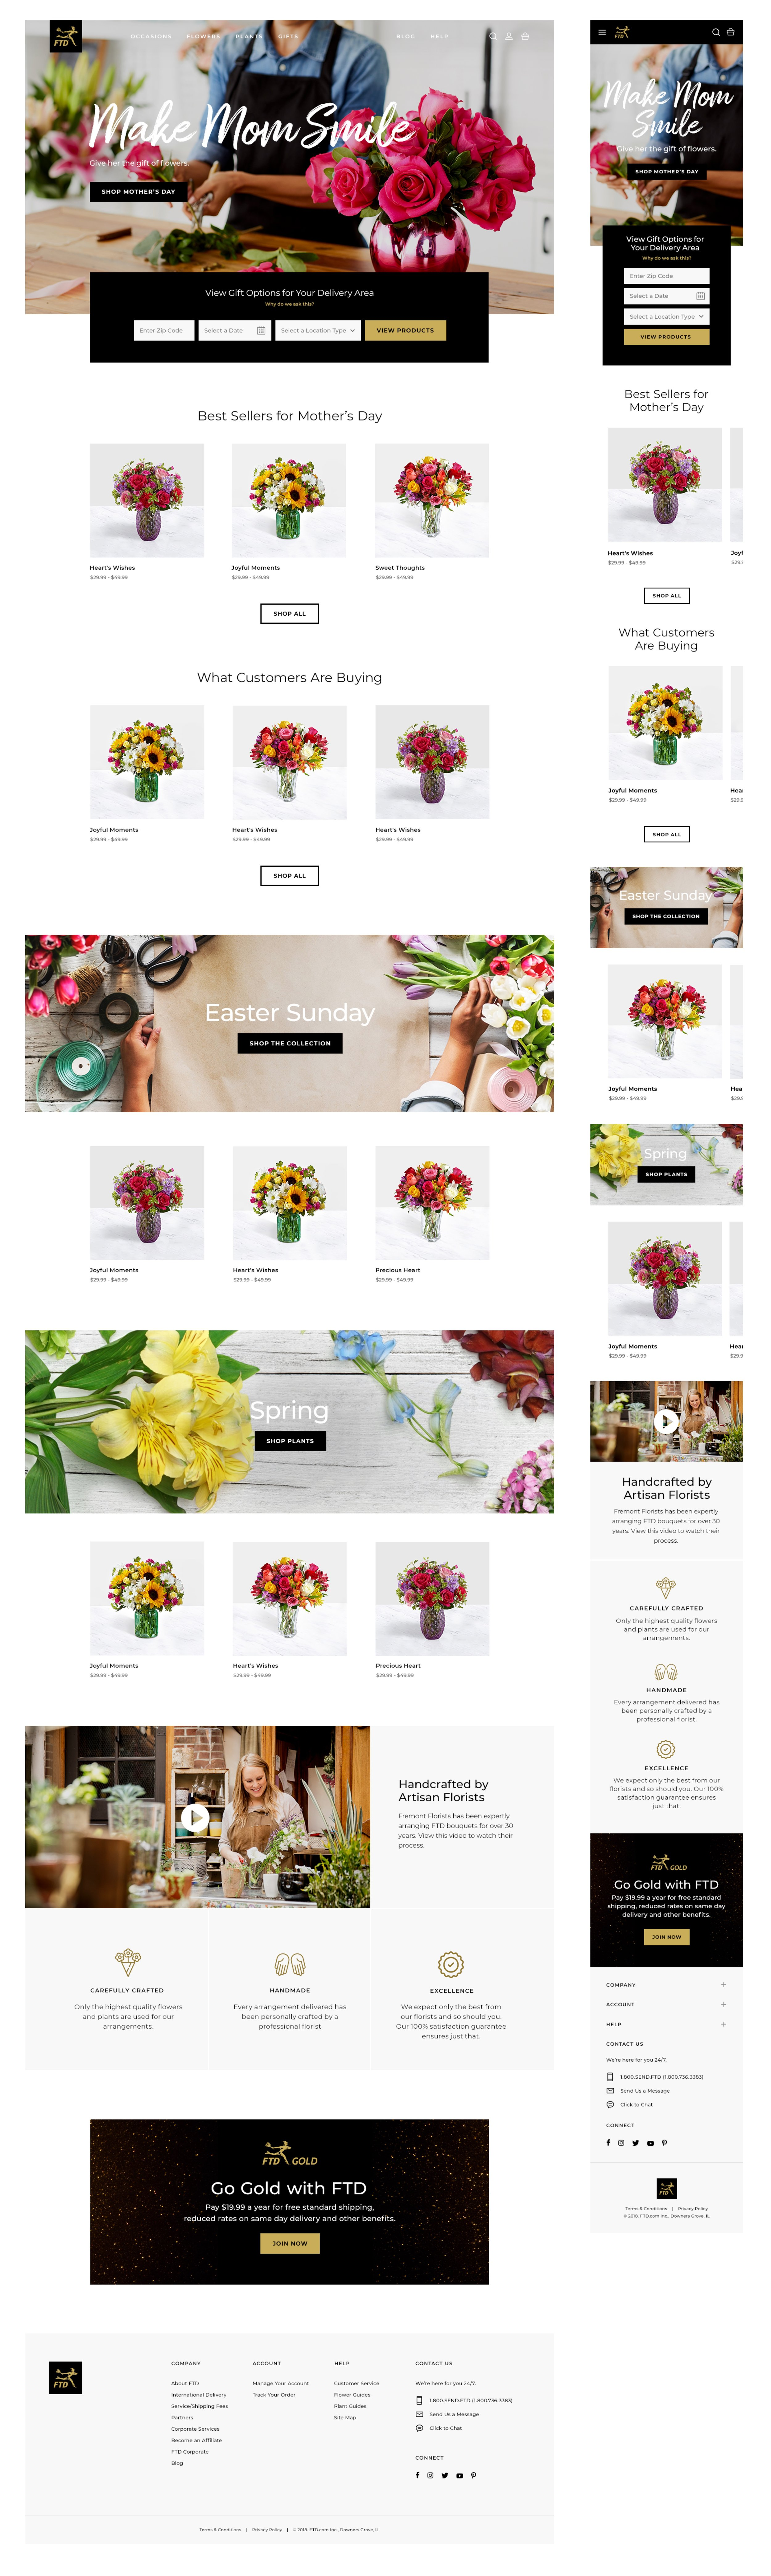 FTD Homepage